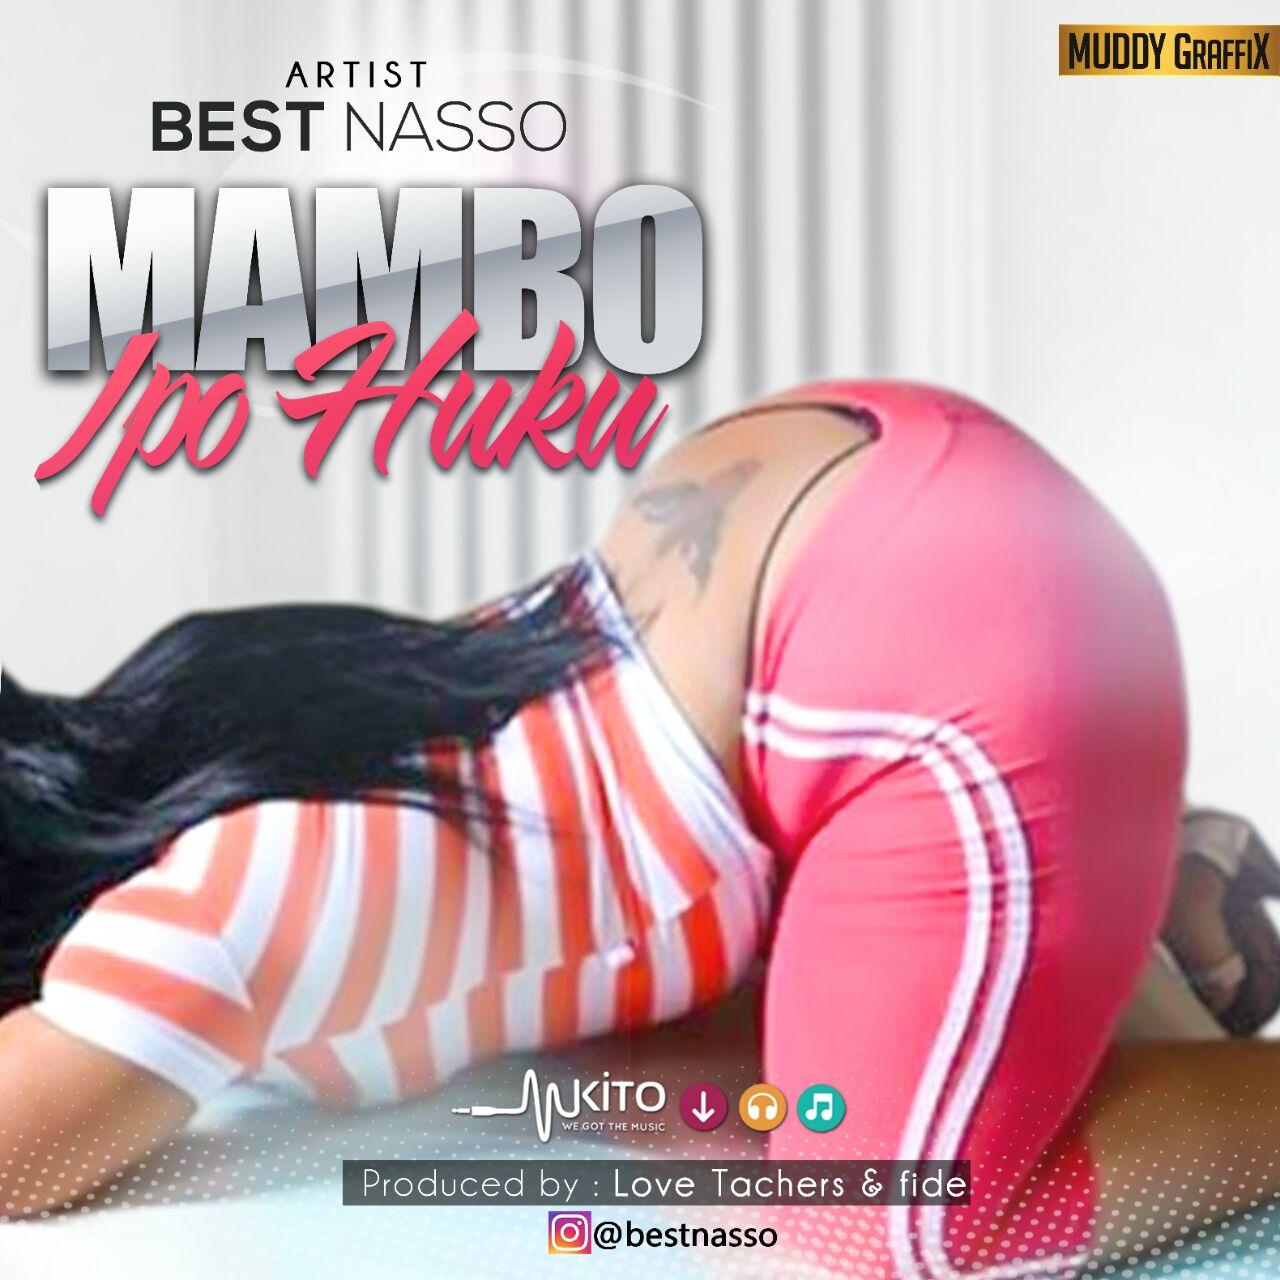 Best Nasso - Fahari